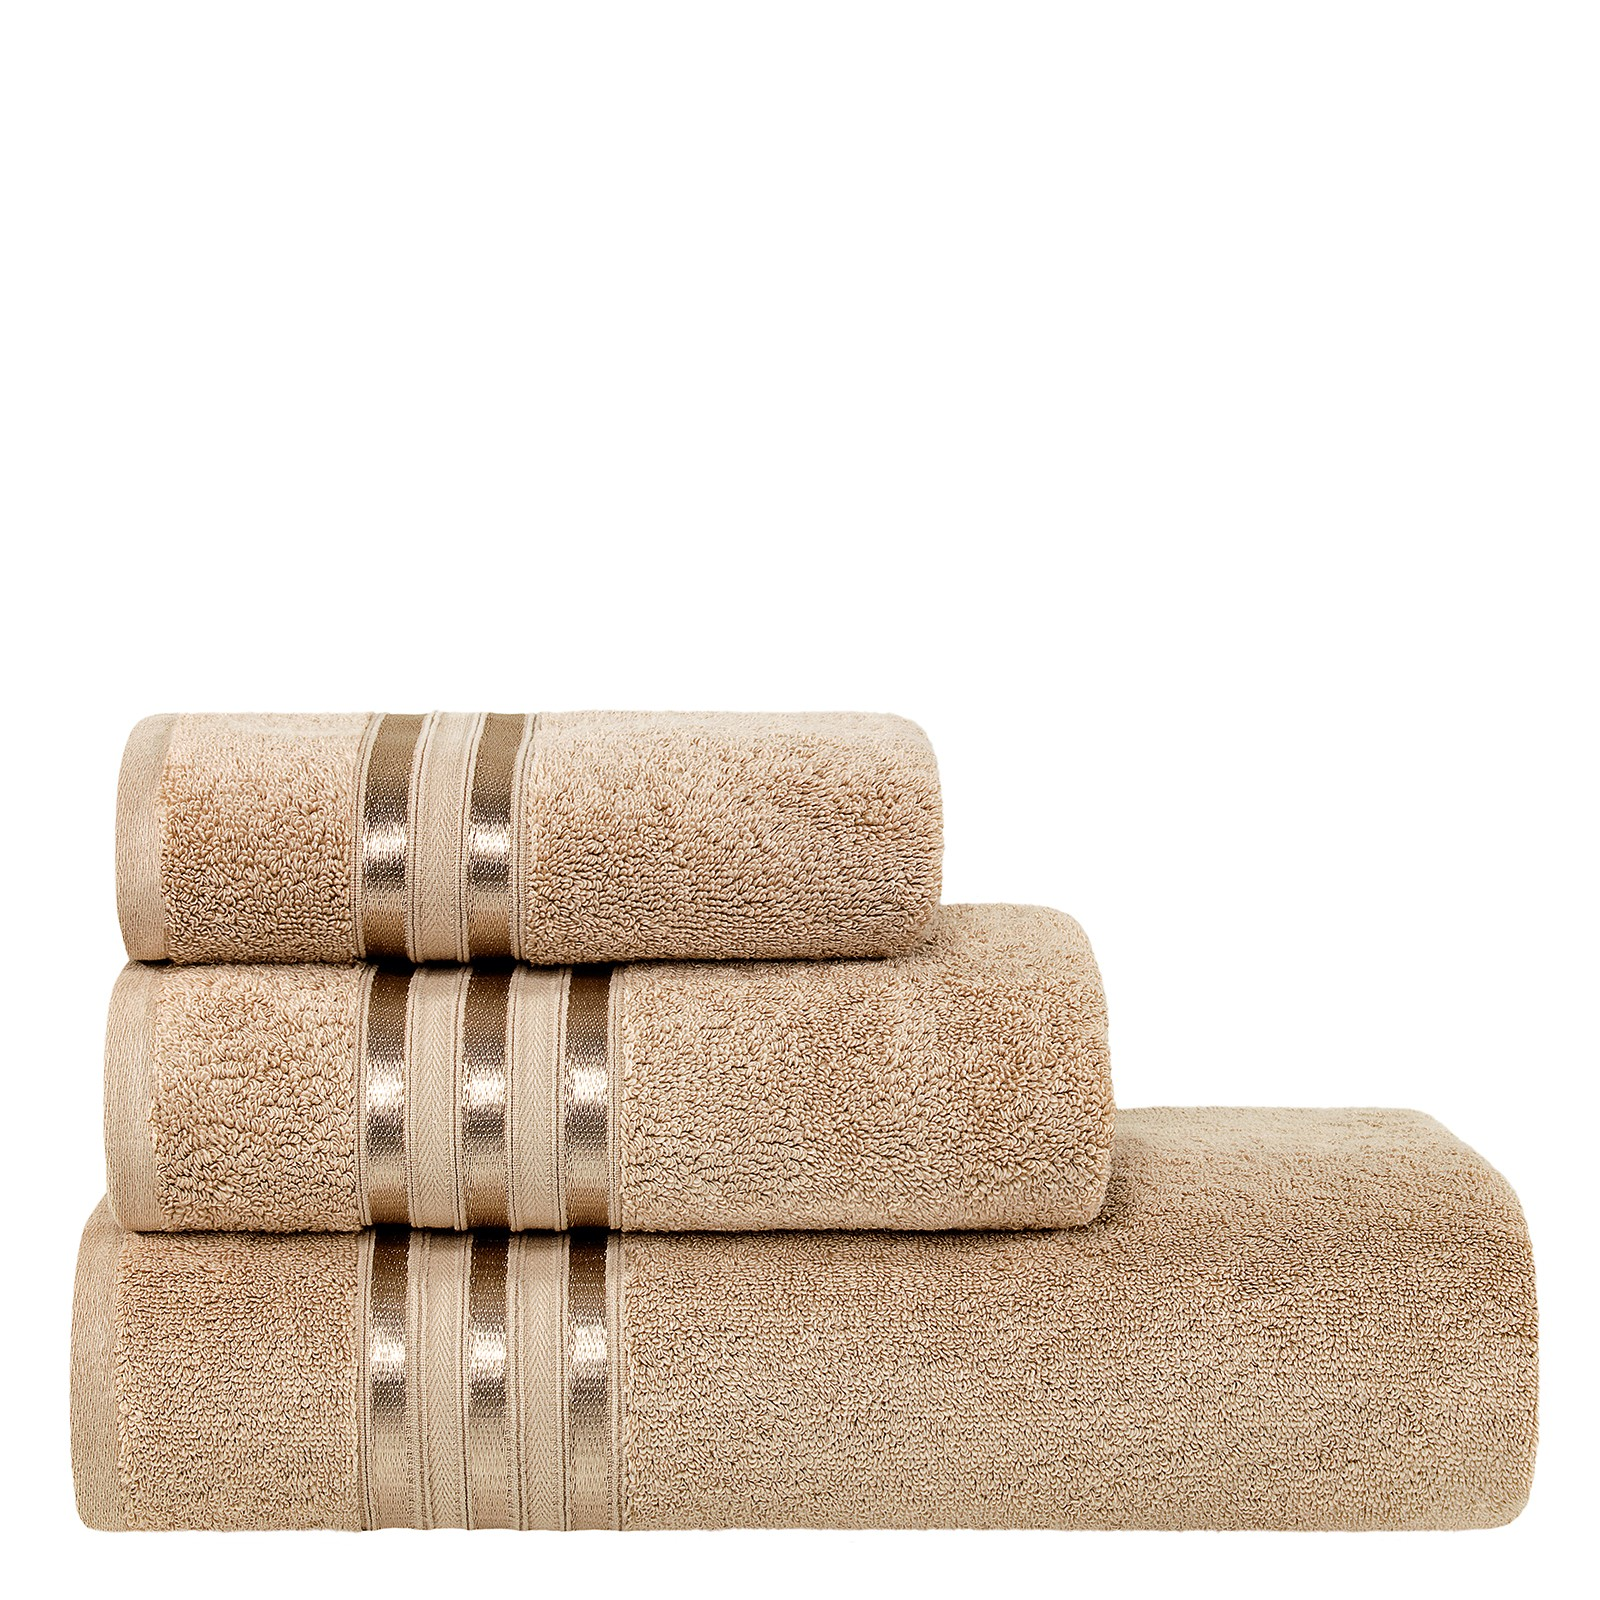 Купить Полотенце аркадия беж 50х100. 600г/м2 (10.00.01.1081), Togas, полотенце, бежевый, 100% хлопок